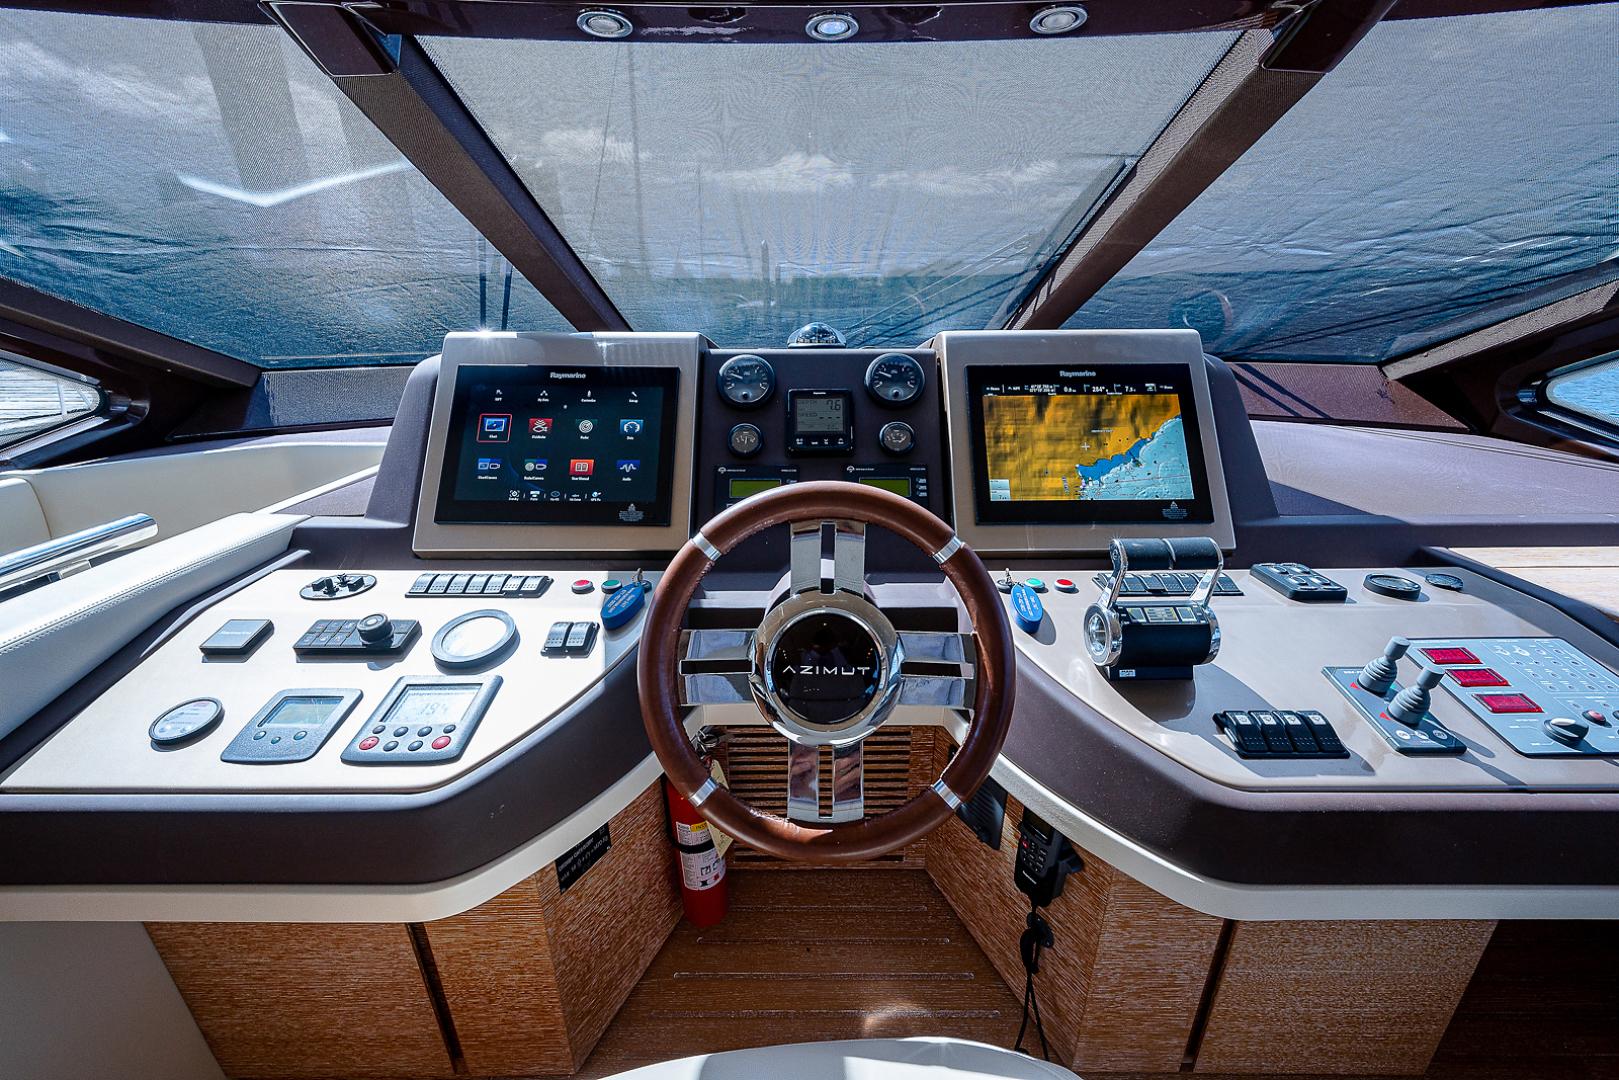 Azimut-58 Fly Motor Yacht 2011-Nova Fort Lauderdale-Florida-United States-58_azimut_nova__helm14-1490539 | Thumbnail